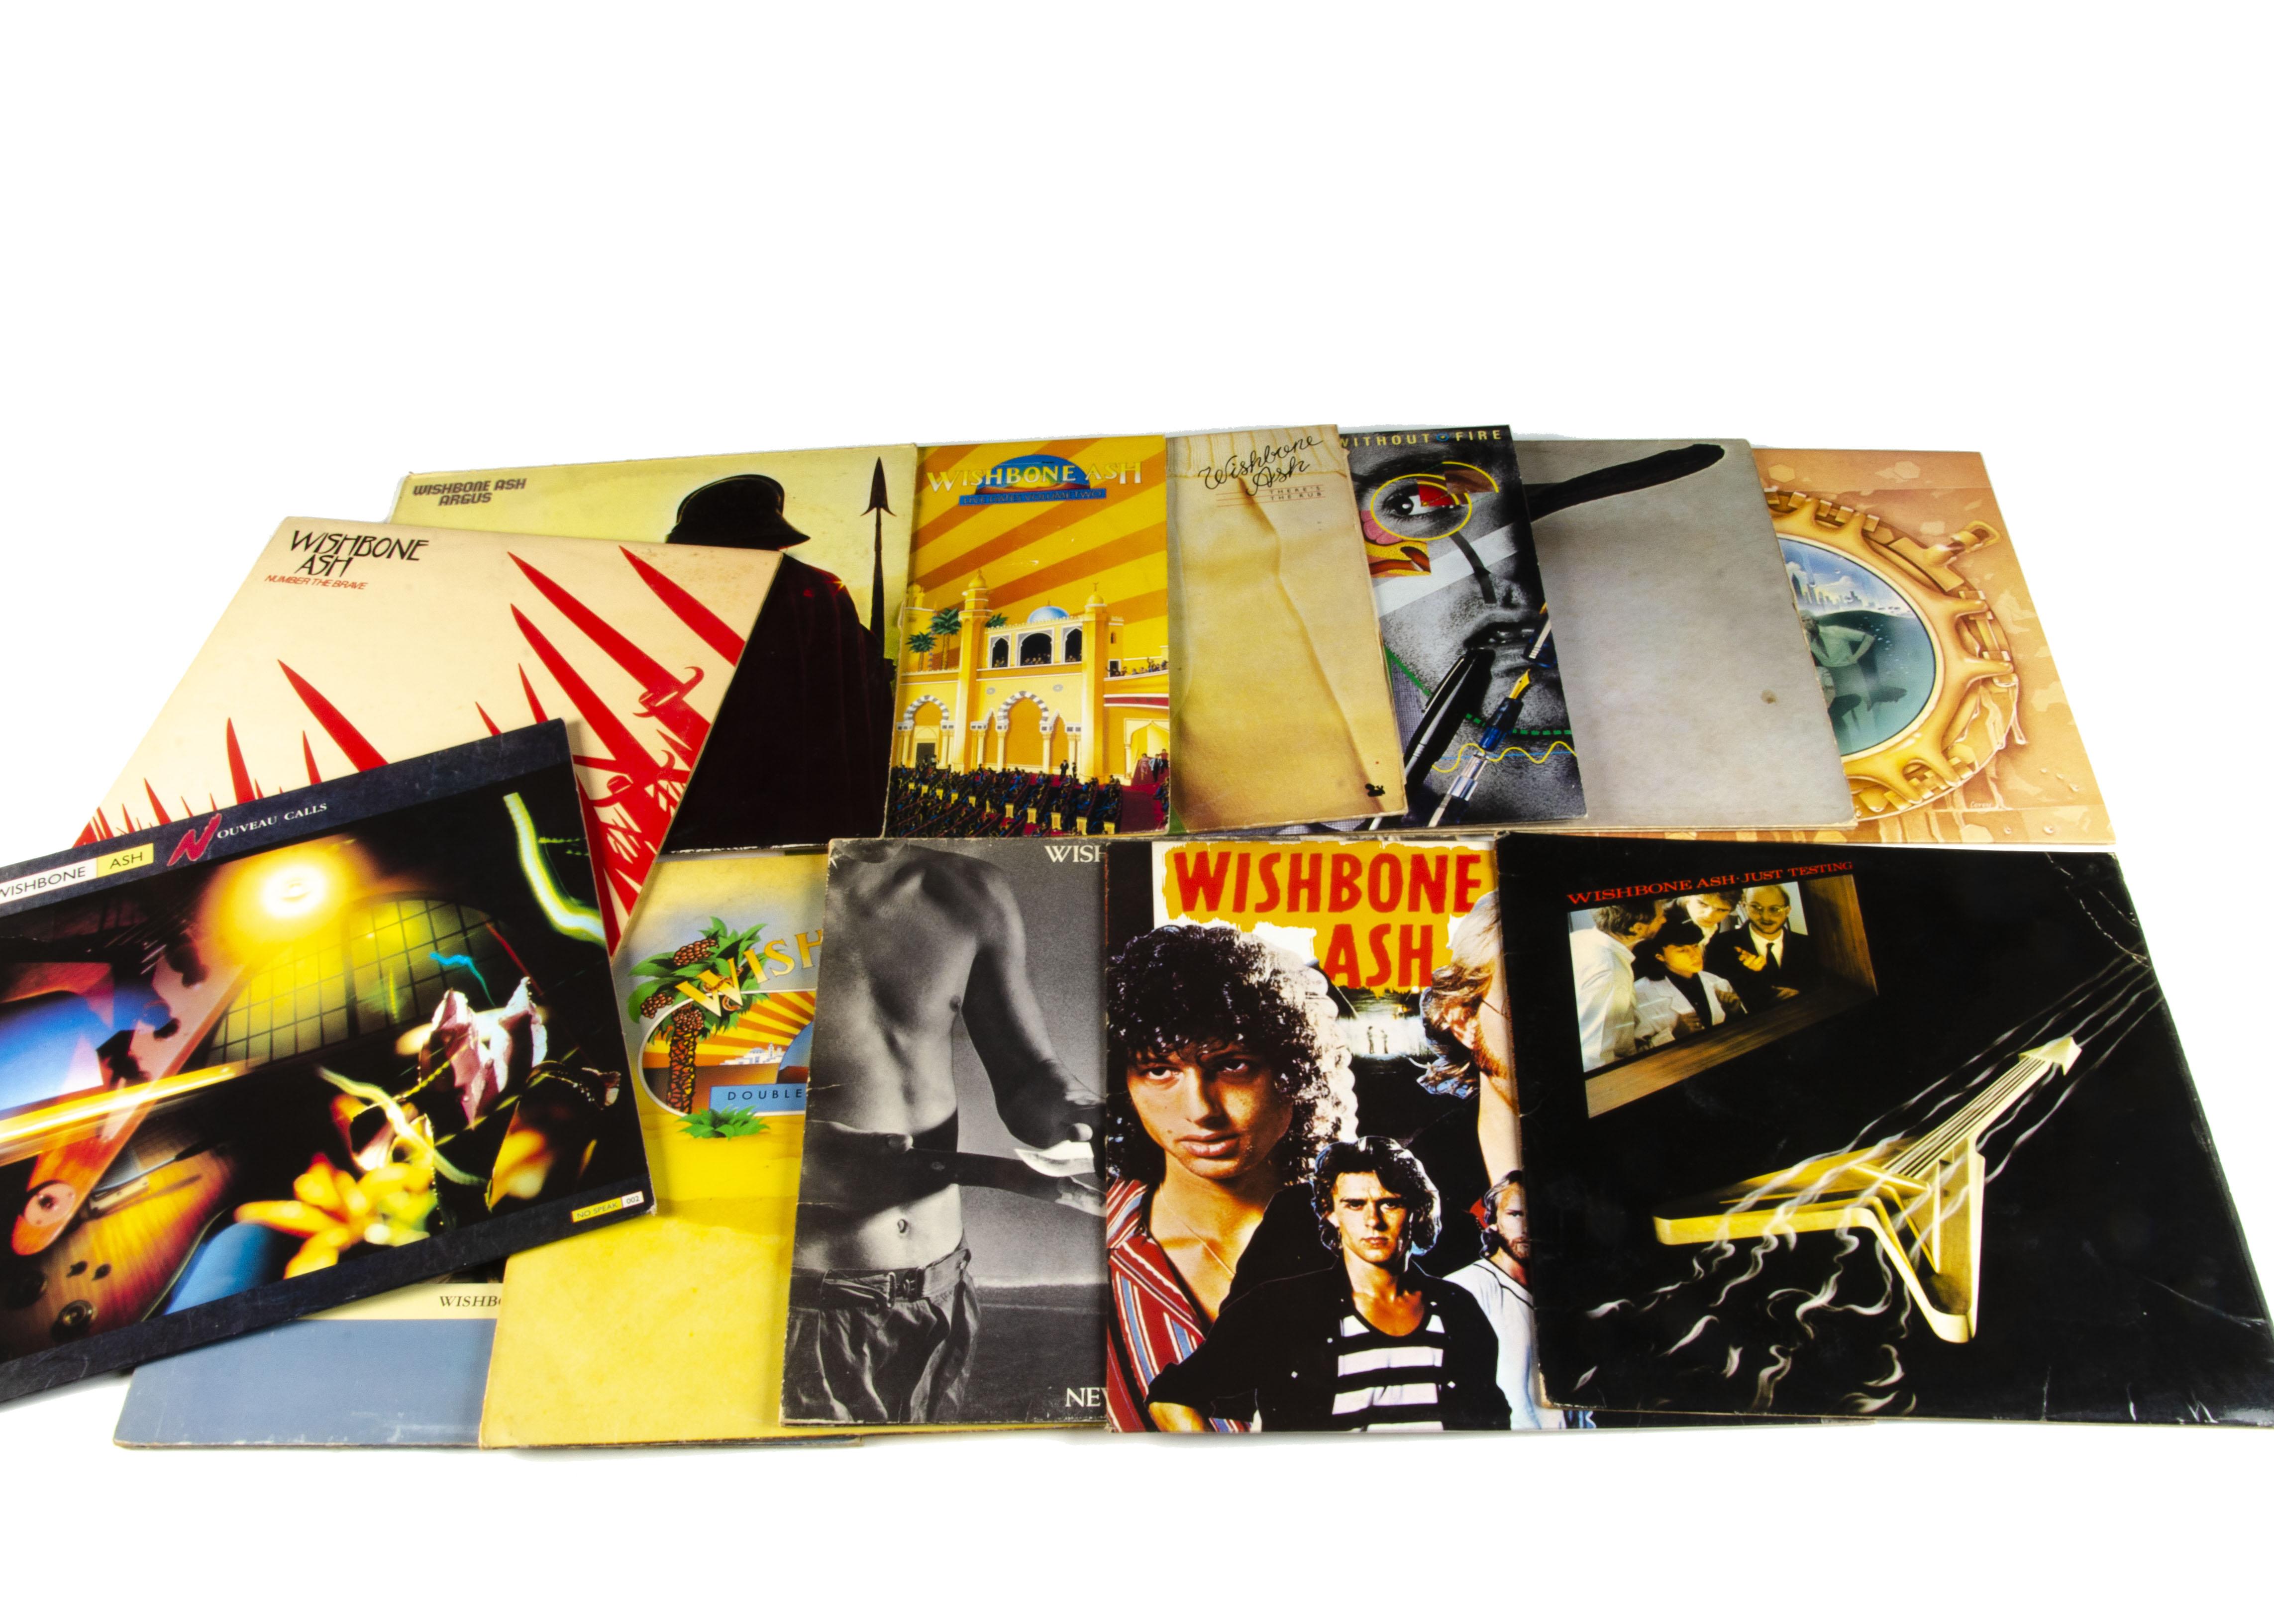 Wishbone Ash LPs, thirteen albums comprising Wishbone Ash (Pink 'Dogbone' labels), Argus (reissue) ,